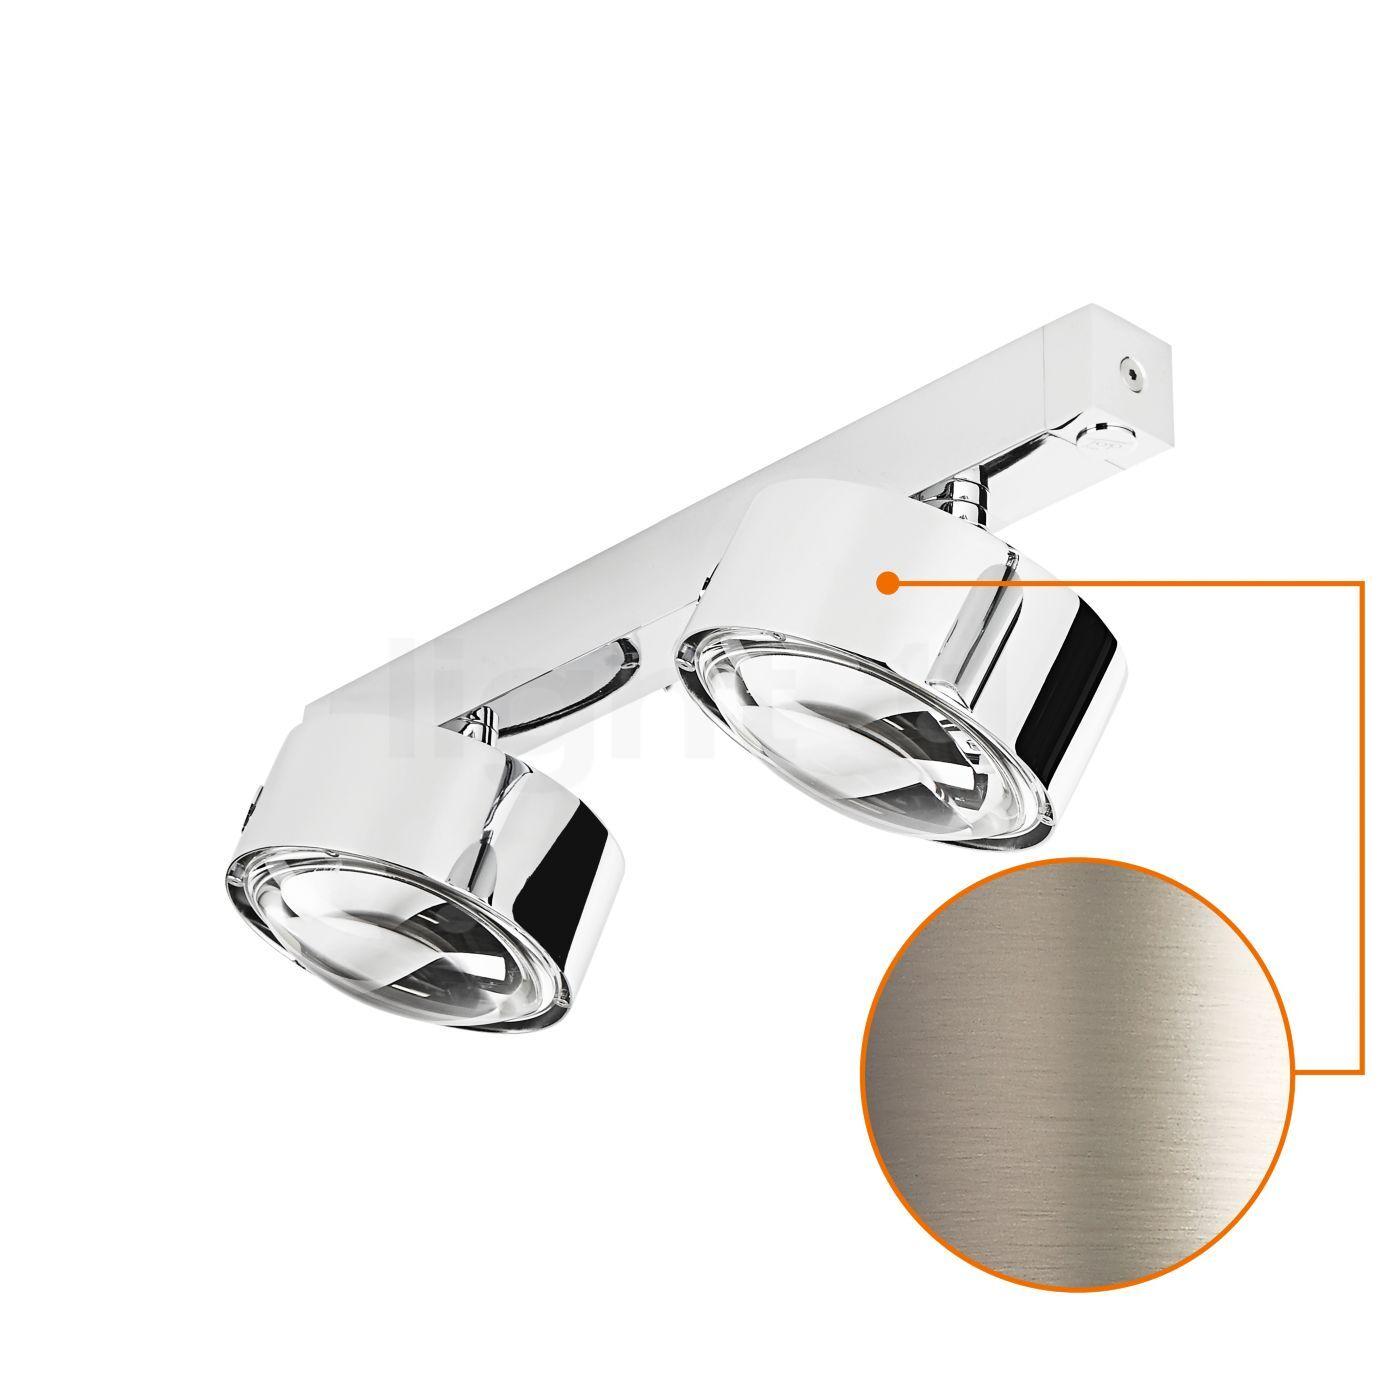 Top Light Puk Maxx Choice Move 45 cm Applique/Plafonnier, nickel mat/lentille mat